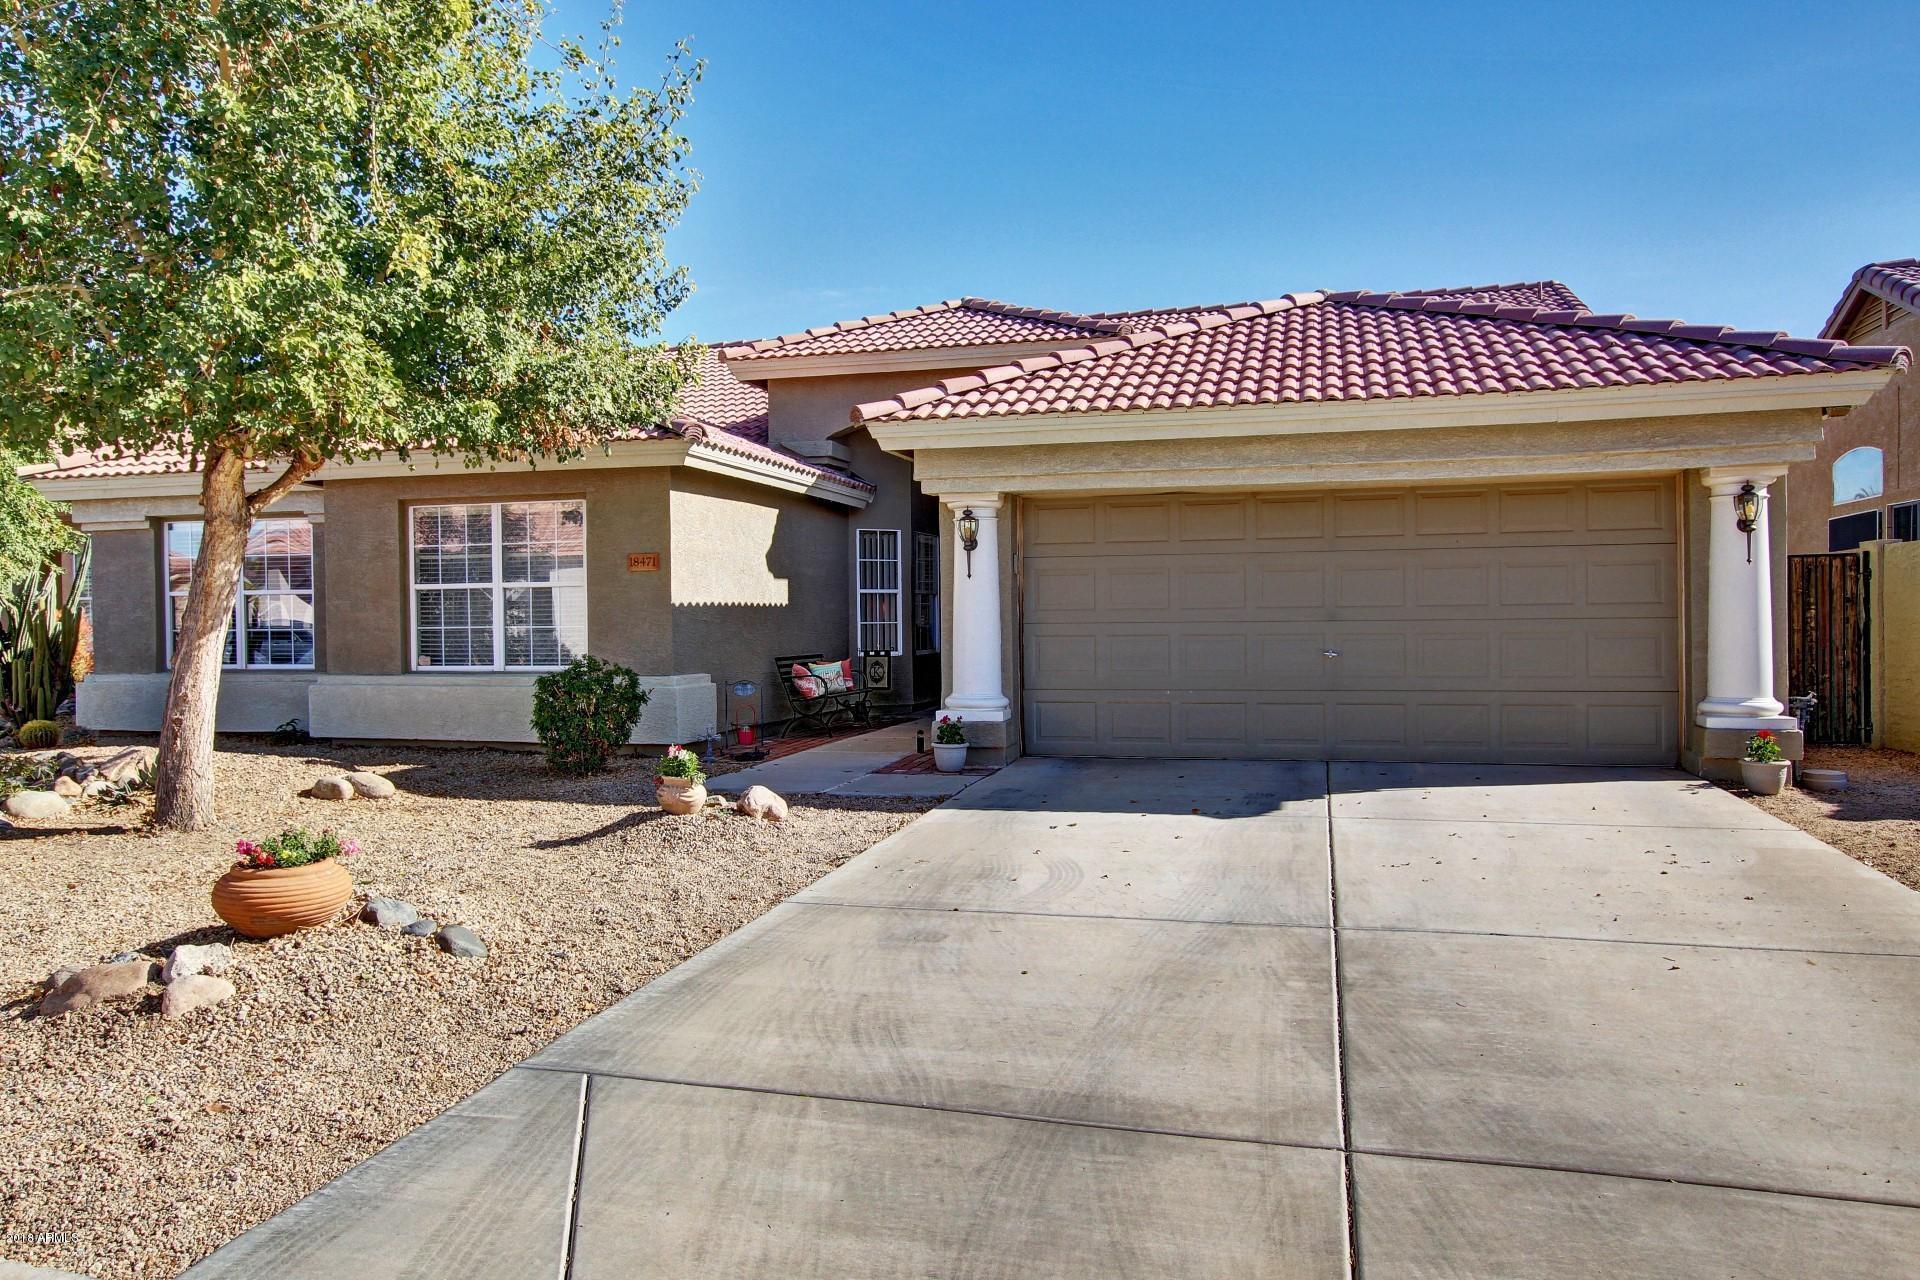 Photo of 18471 N 116TH Drive, Surprise, AZ 85378